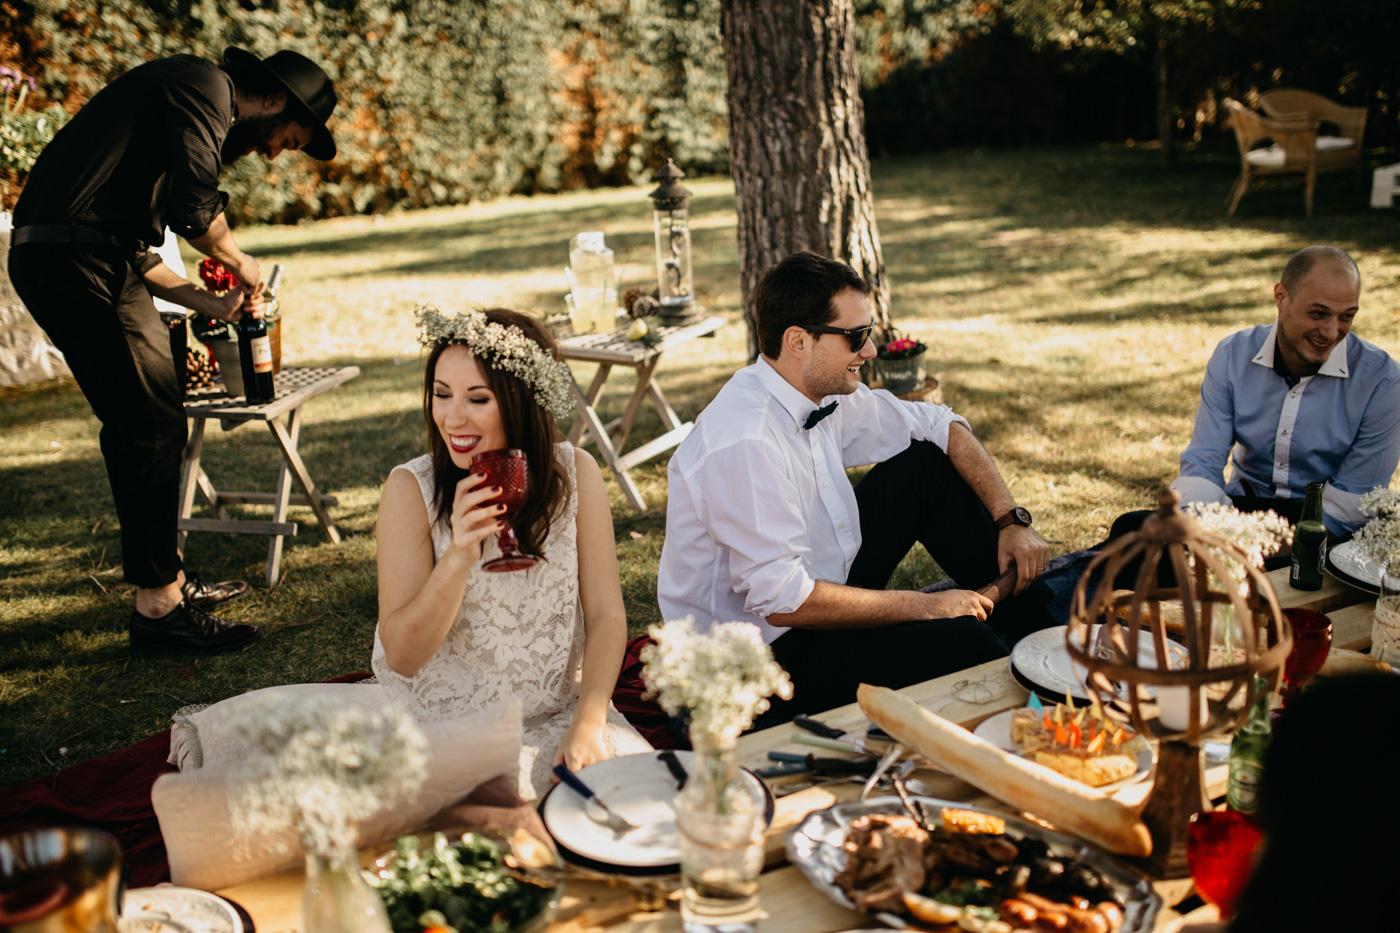 Velvet-Hush-fotografos-boda-al-aire-libre-madrid-065